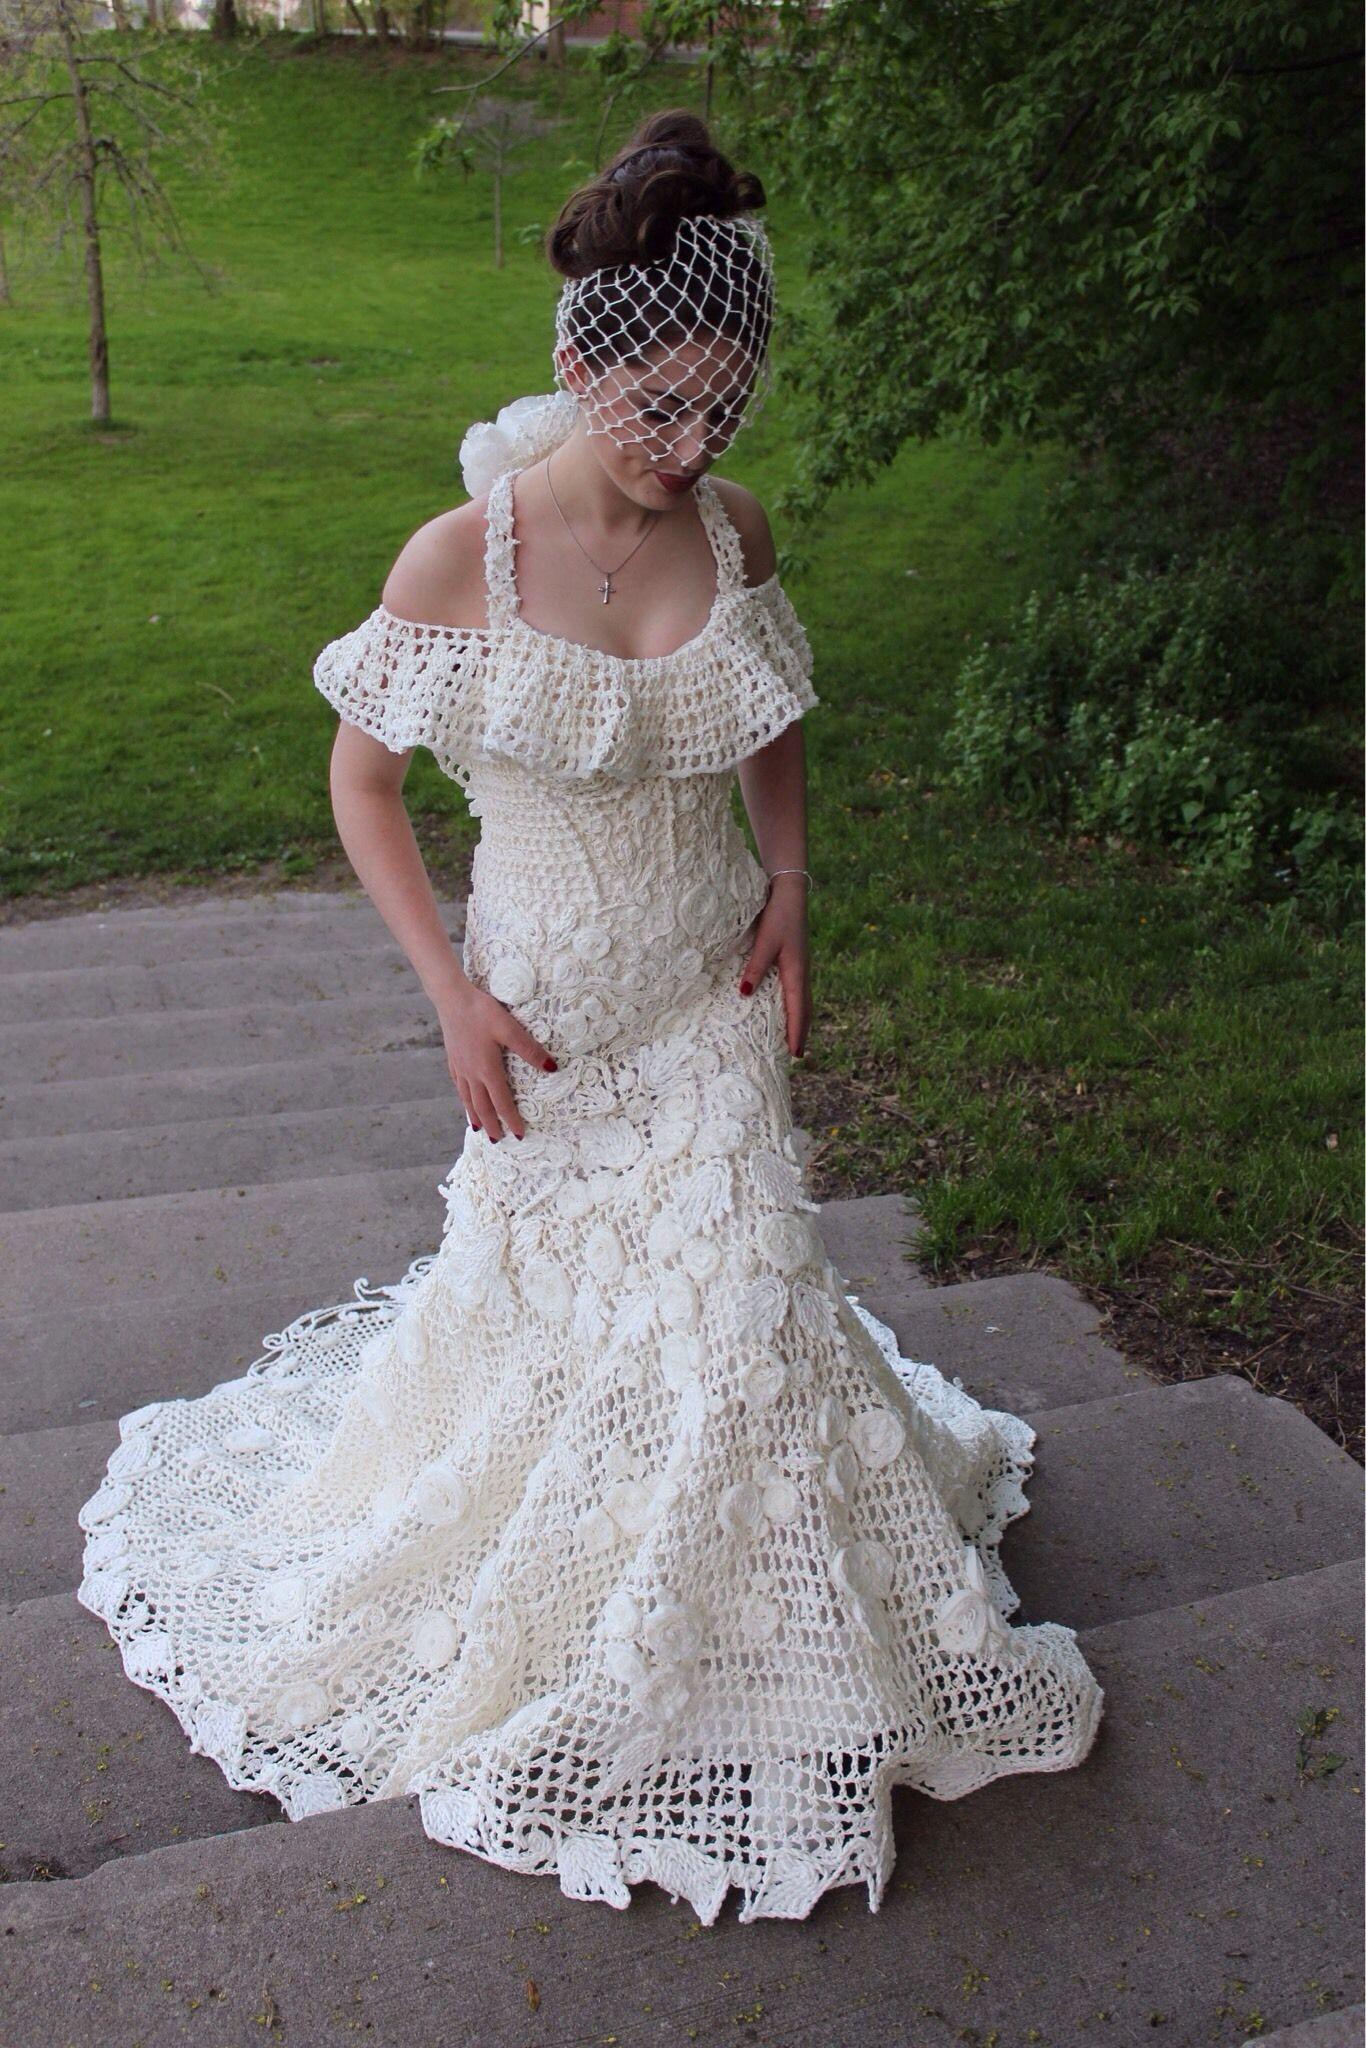 15th Annual Toilet Paper Wedding Dress Contest Via Aol Lifestyle Read More Https Www A Crochet Wedding Dresses Toilet Paper Wedding Dress Diy Wedding Dress